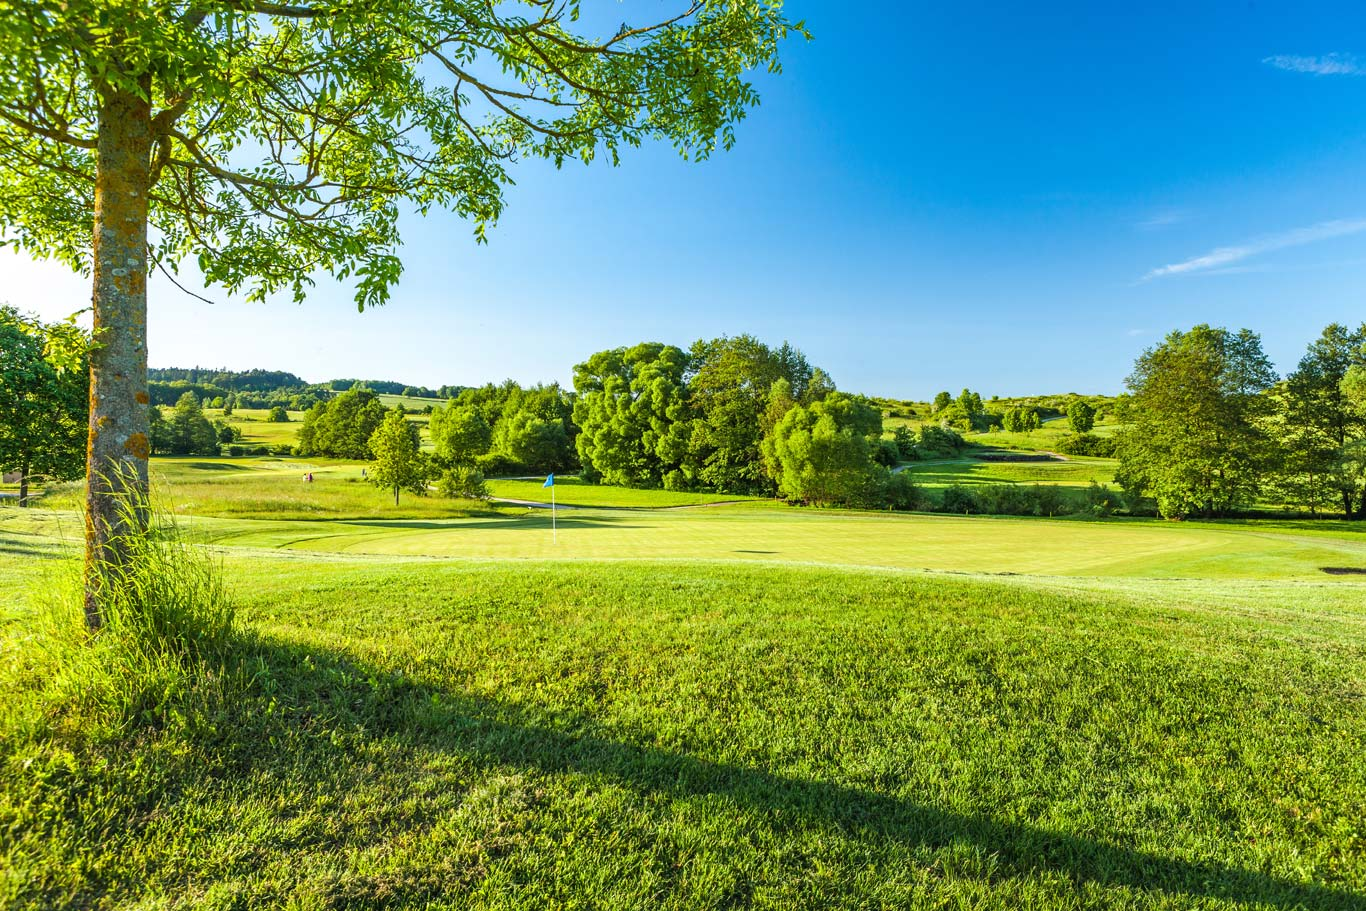 golfclub-praforst-bahn-07-gruen